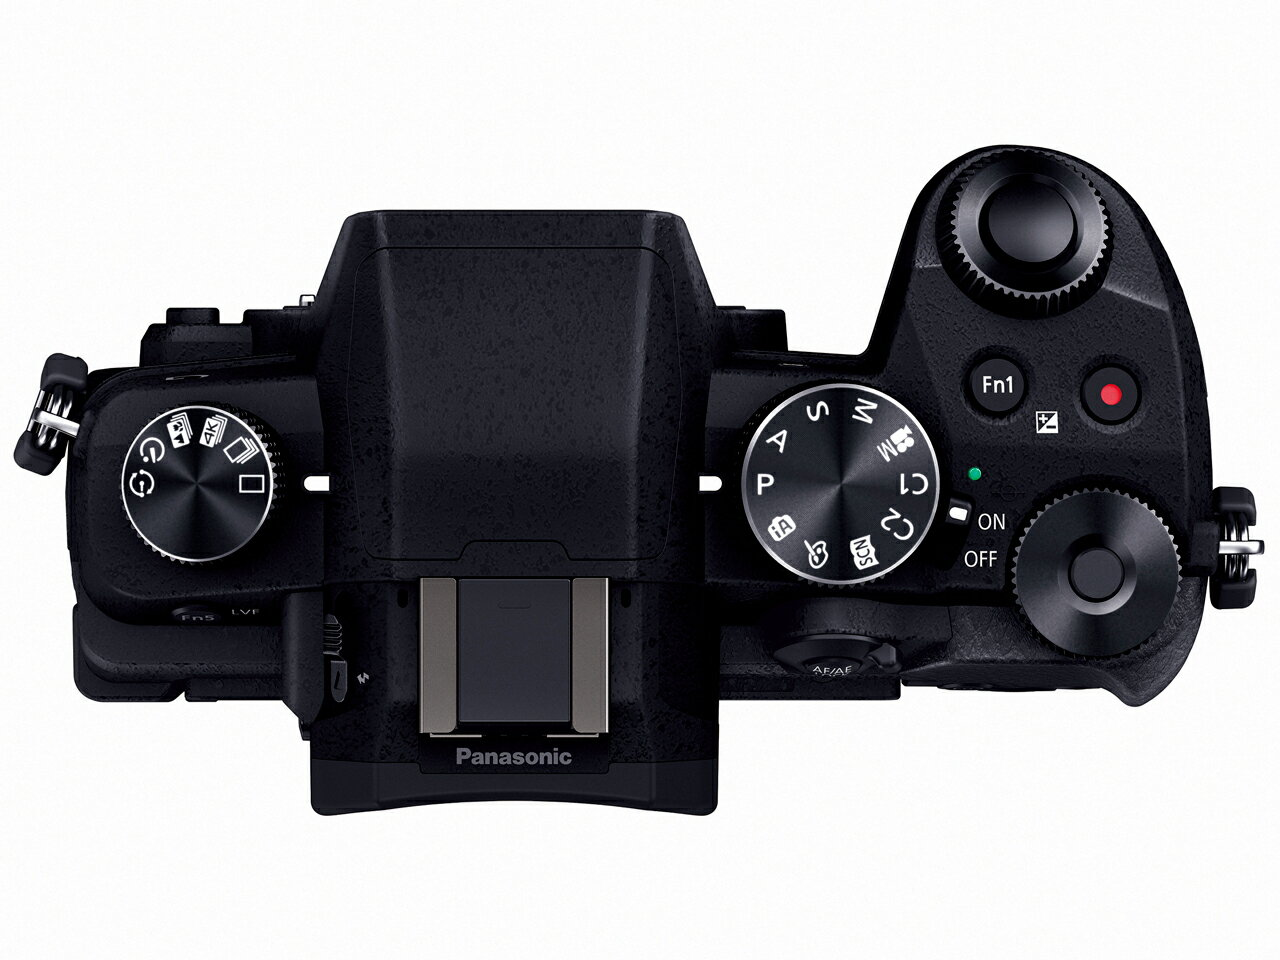 Panasonic LUMIX ミラーレス一眼カメラ G8 ボディ 1600万画素 ブラック DMC-G8-K パナソニック ルミックス